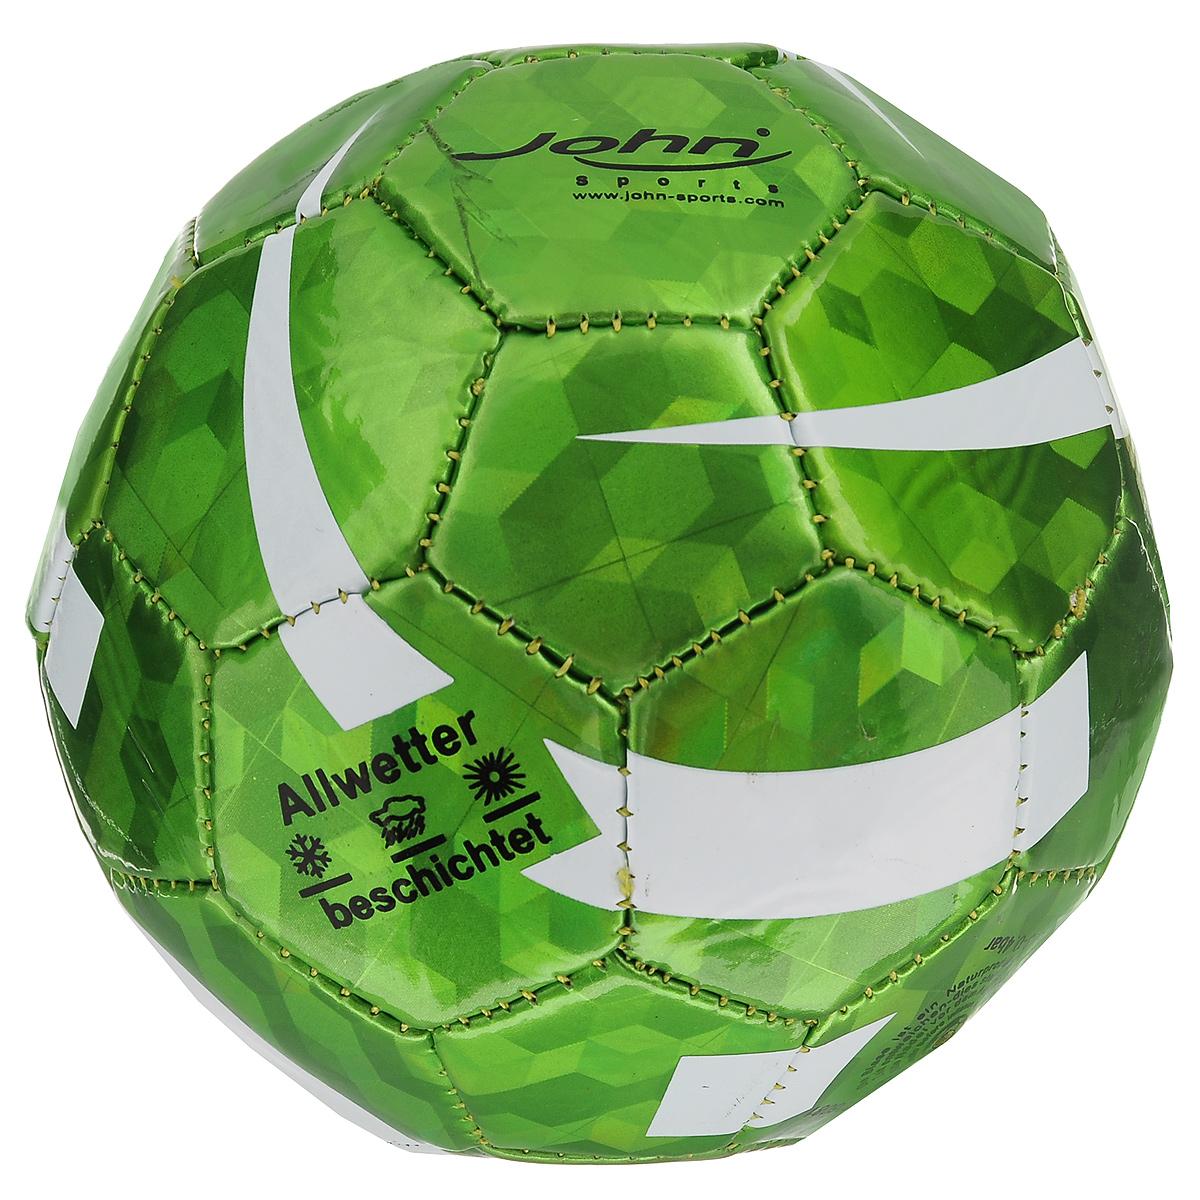 "Мяч для мини-футбола John ""Алмаз"", цвет: зеленый, 14,5 см"